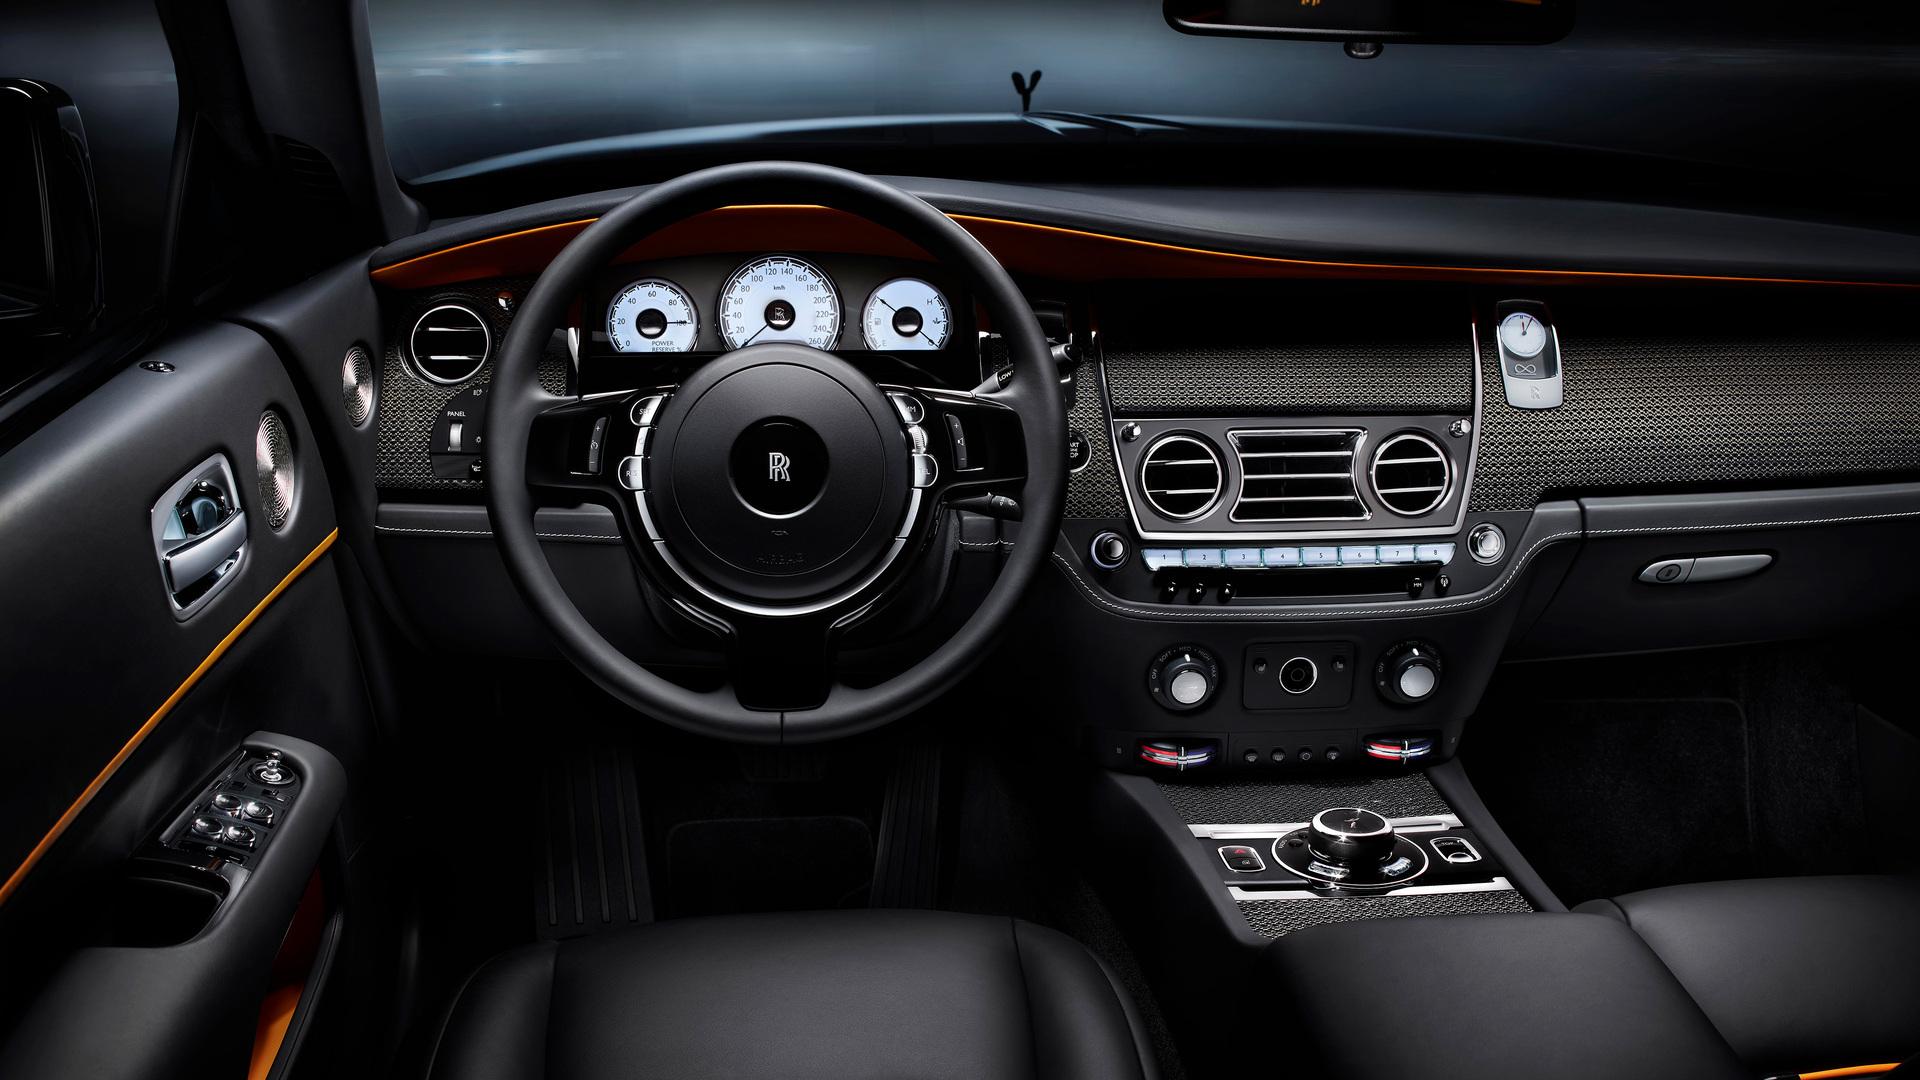 1920x1080 Rolls Royce Dawn Black Badge Interior 4k Laptop Full Hd